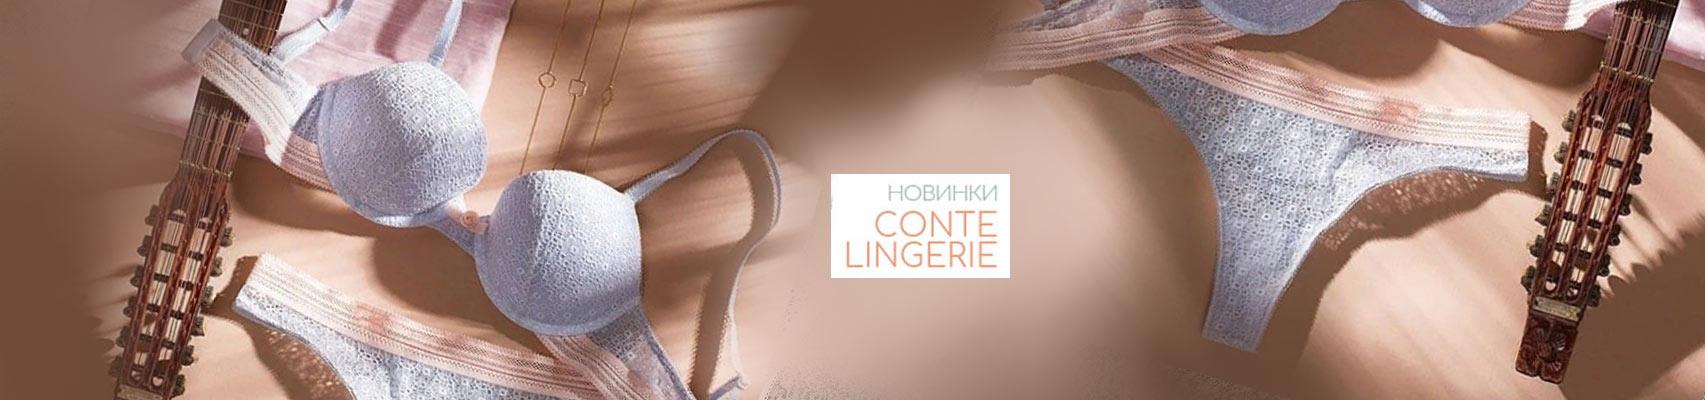 Новинки белья Conte Lingerie